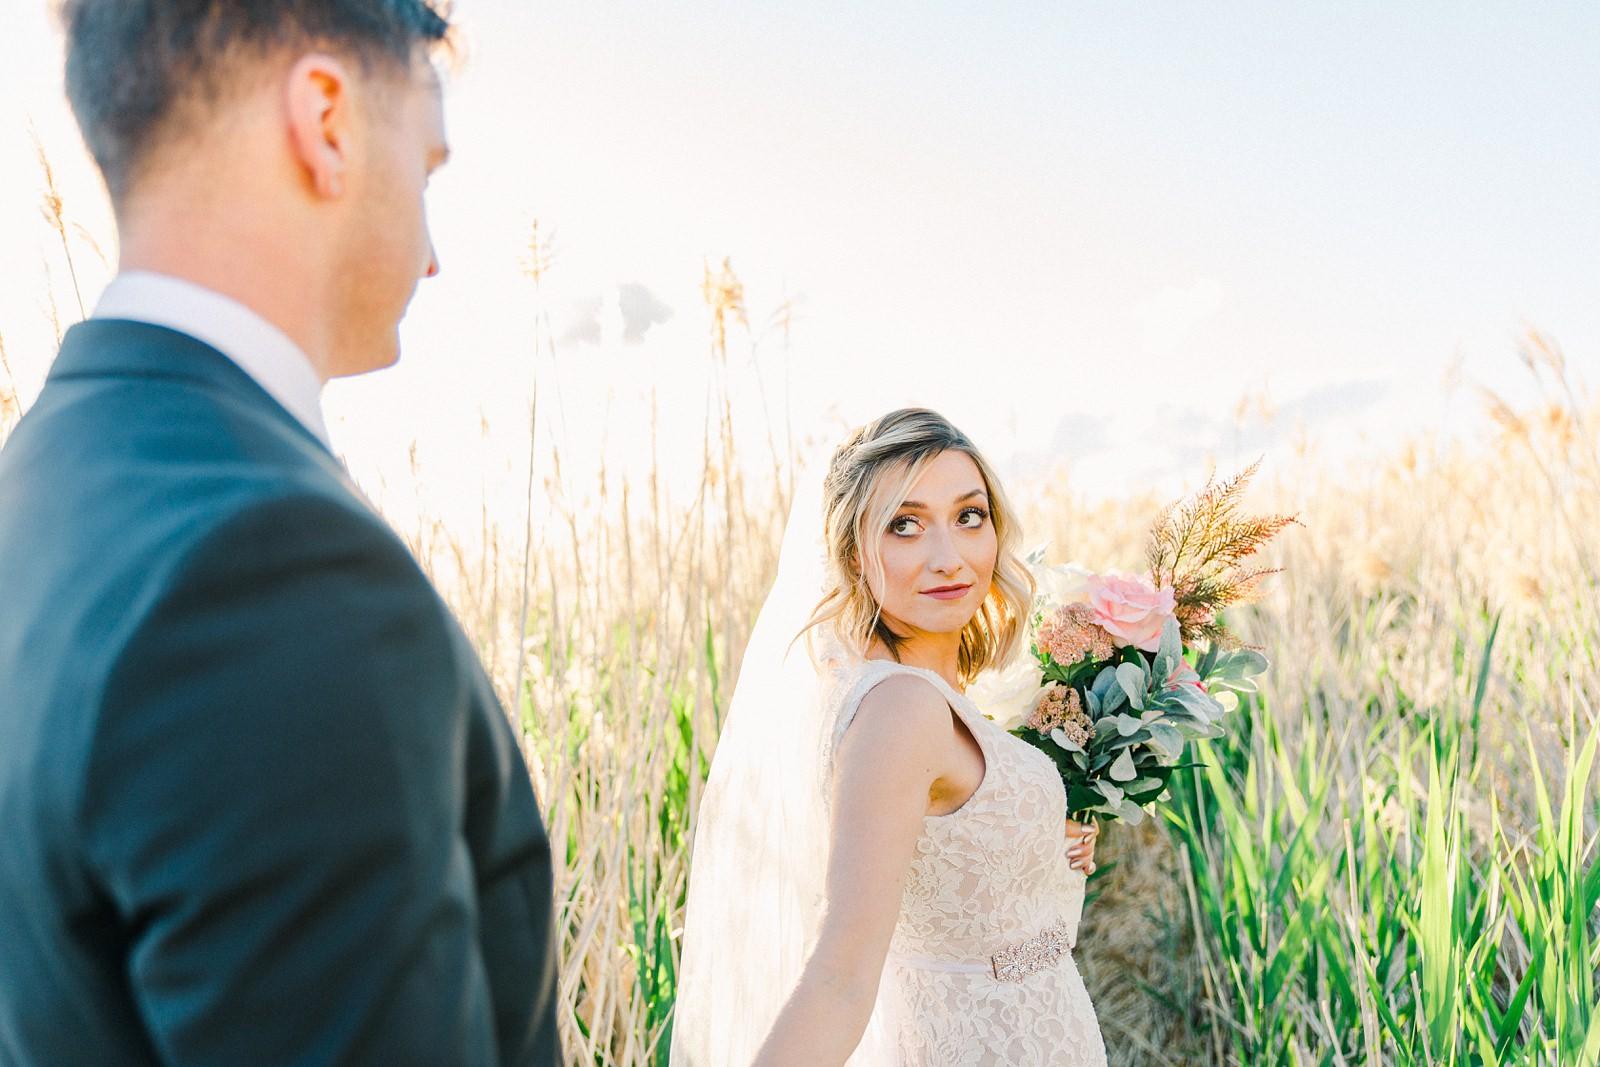 Salt Lake City Utah Bridal Wedding Photography, Tunnel Springs Park, bride and groom golden sunset light